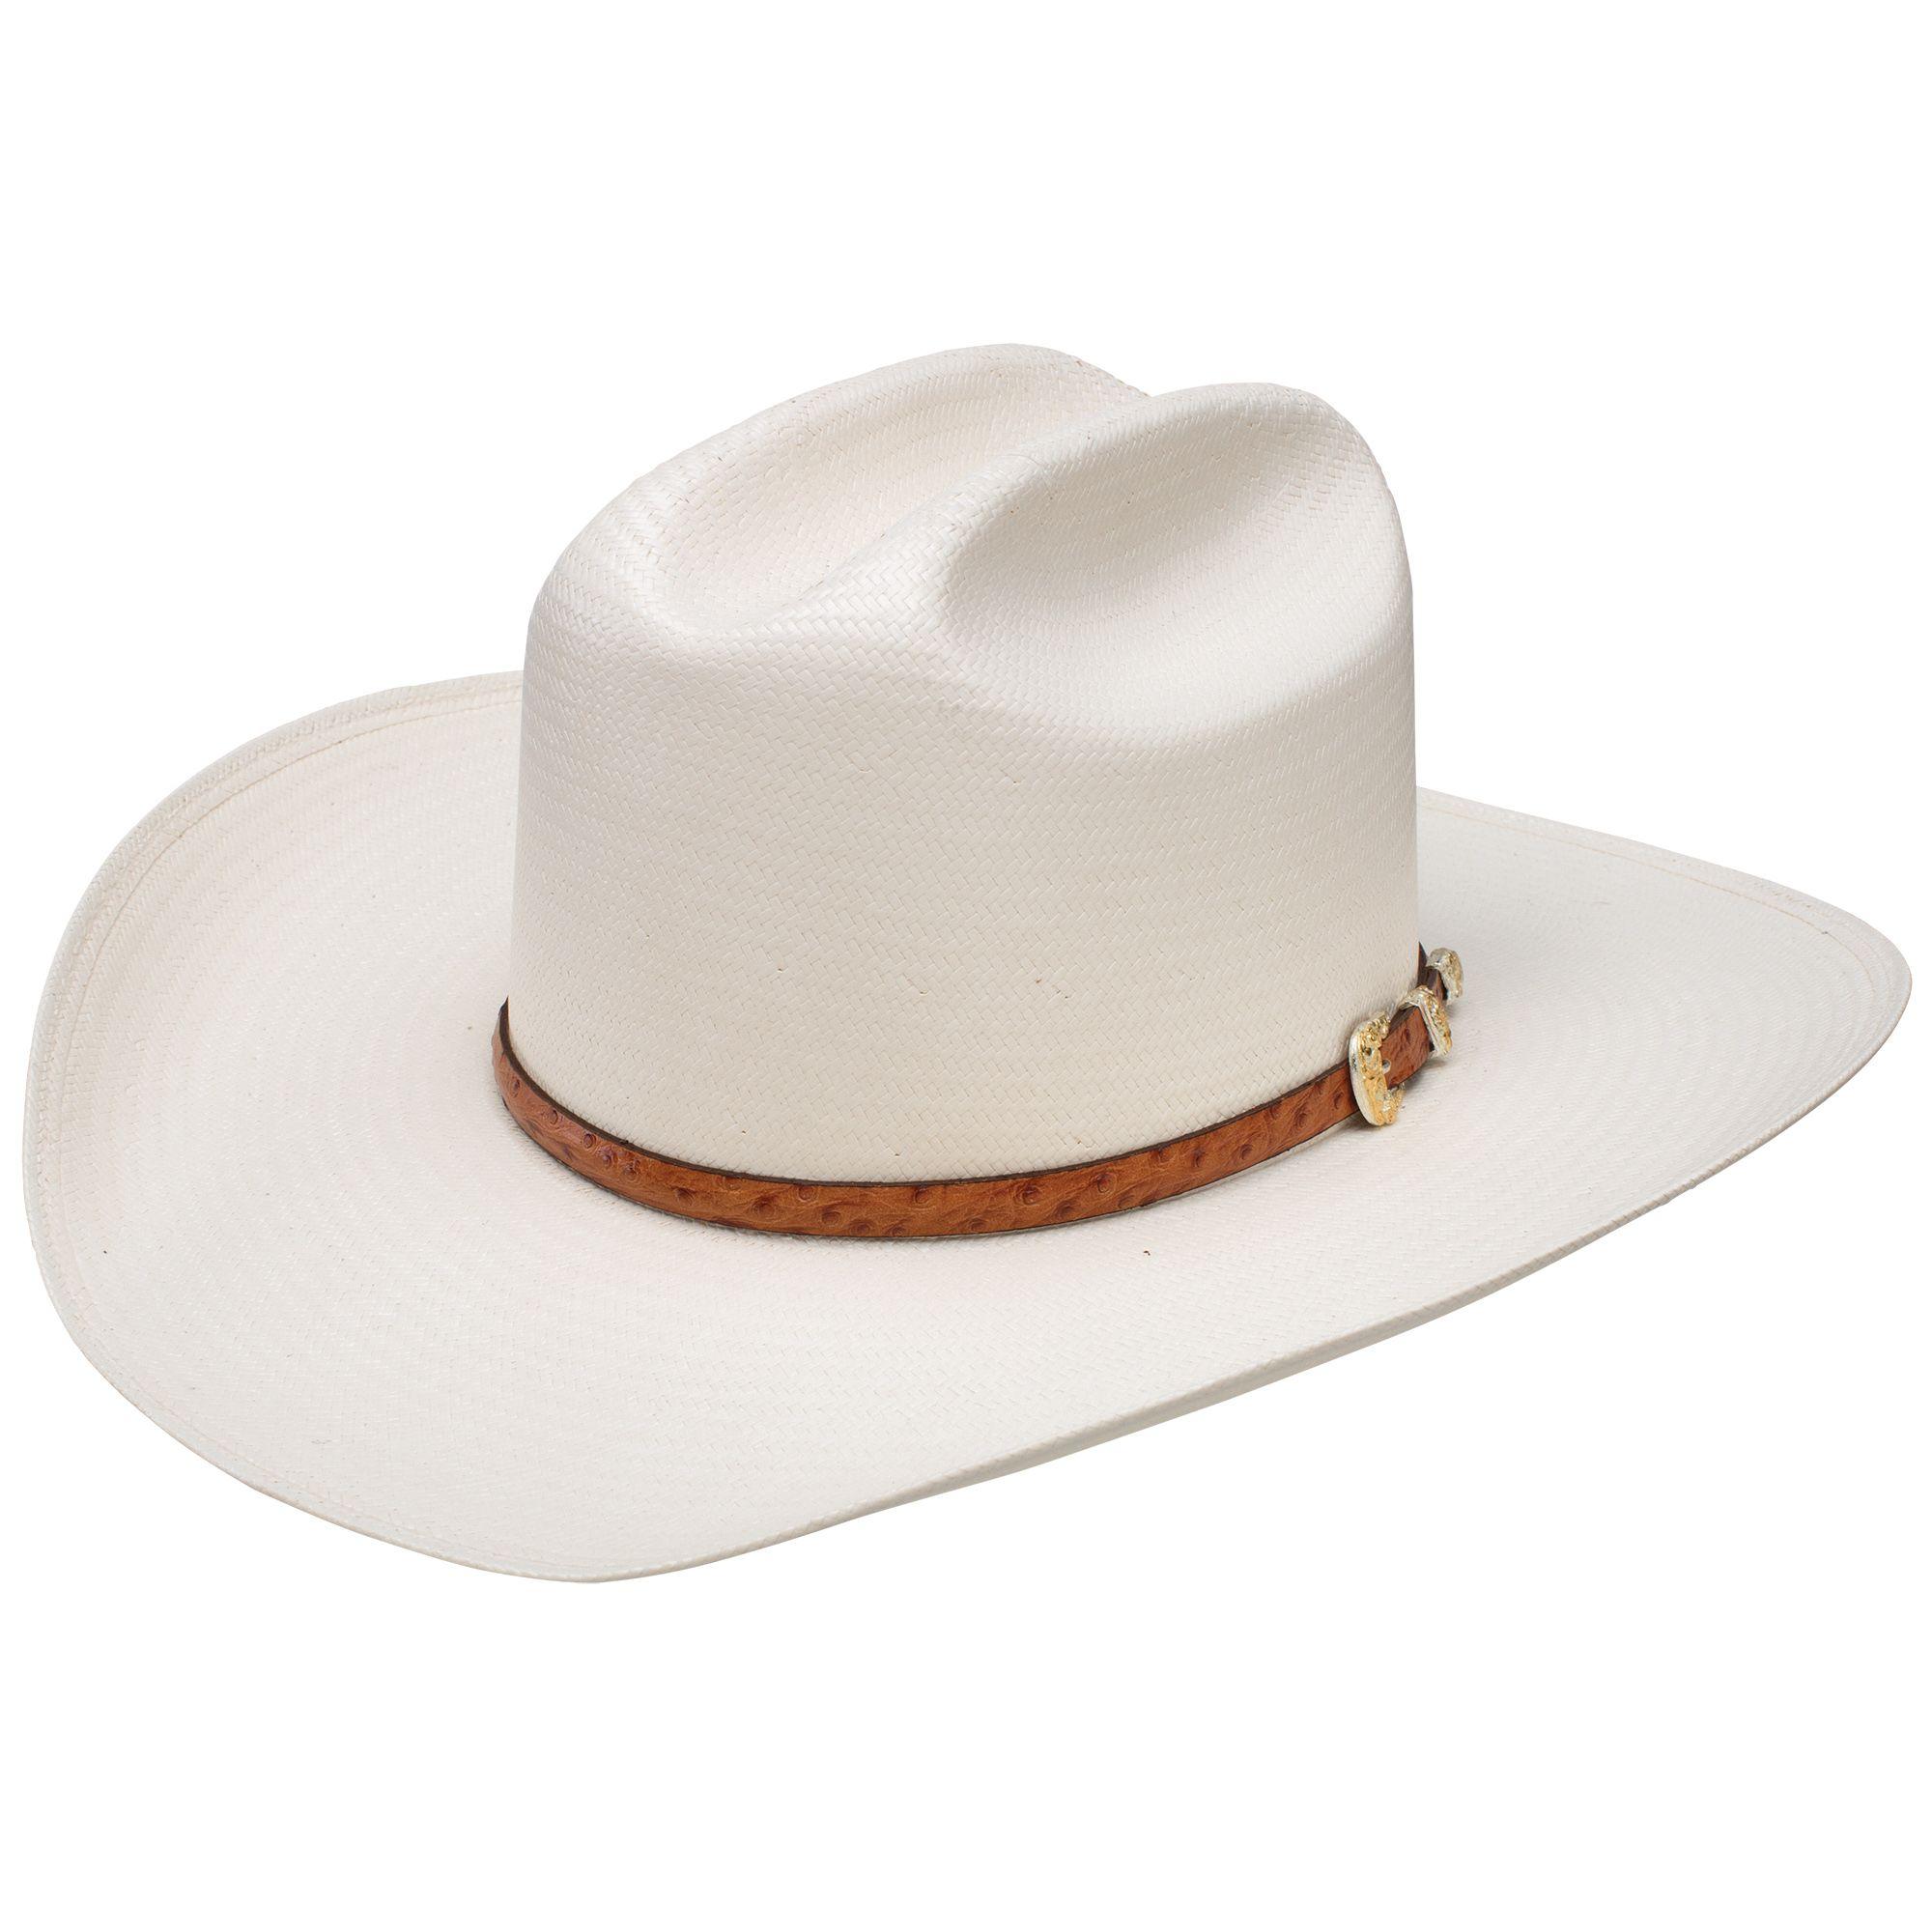 San Miguel Western Cowboy Hats Western Wear Outfits Cowboy Hats